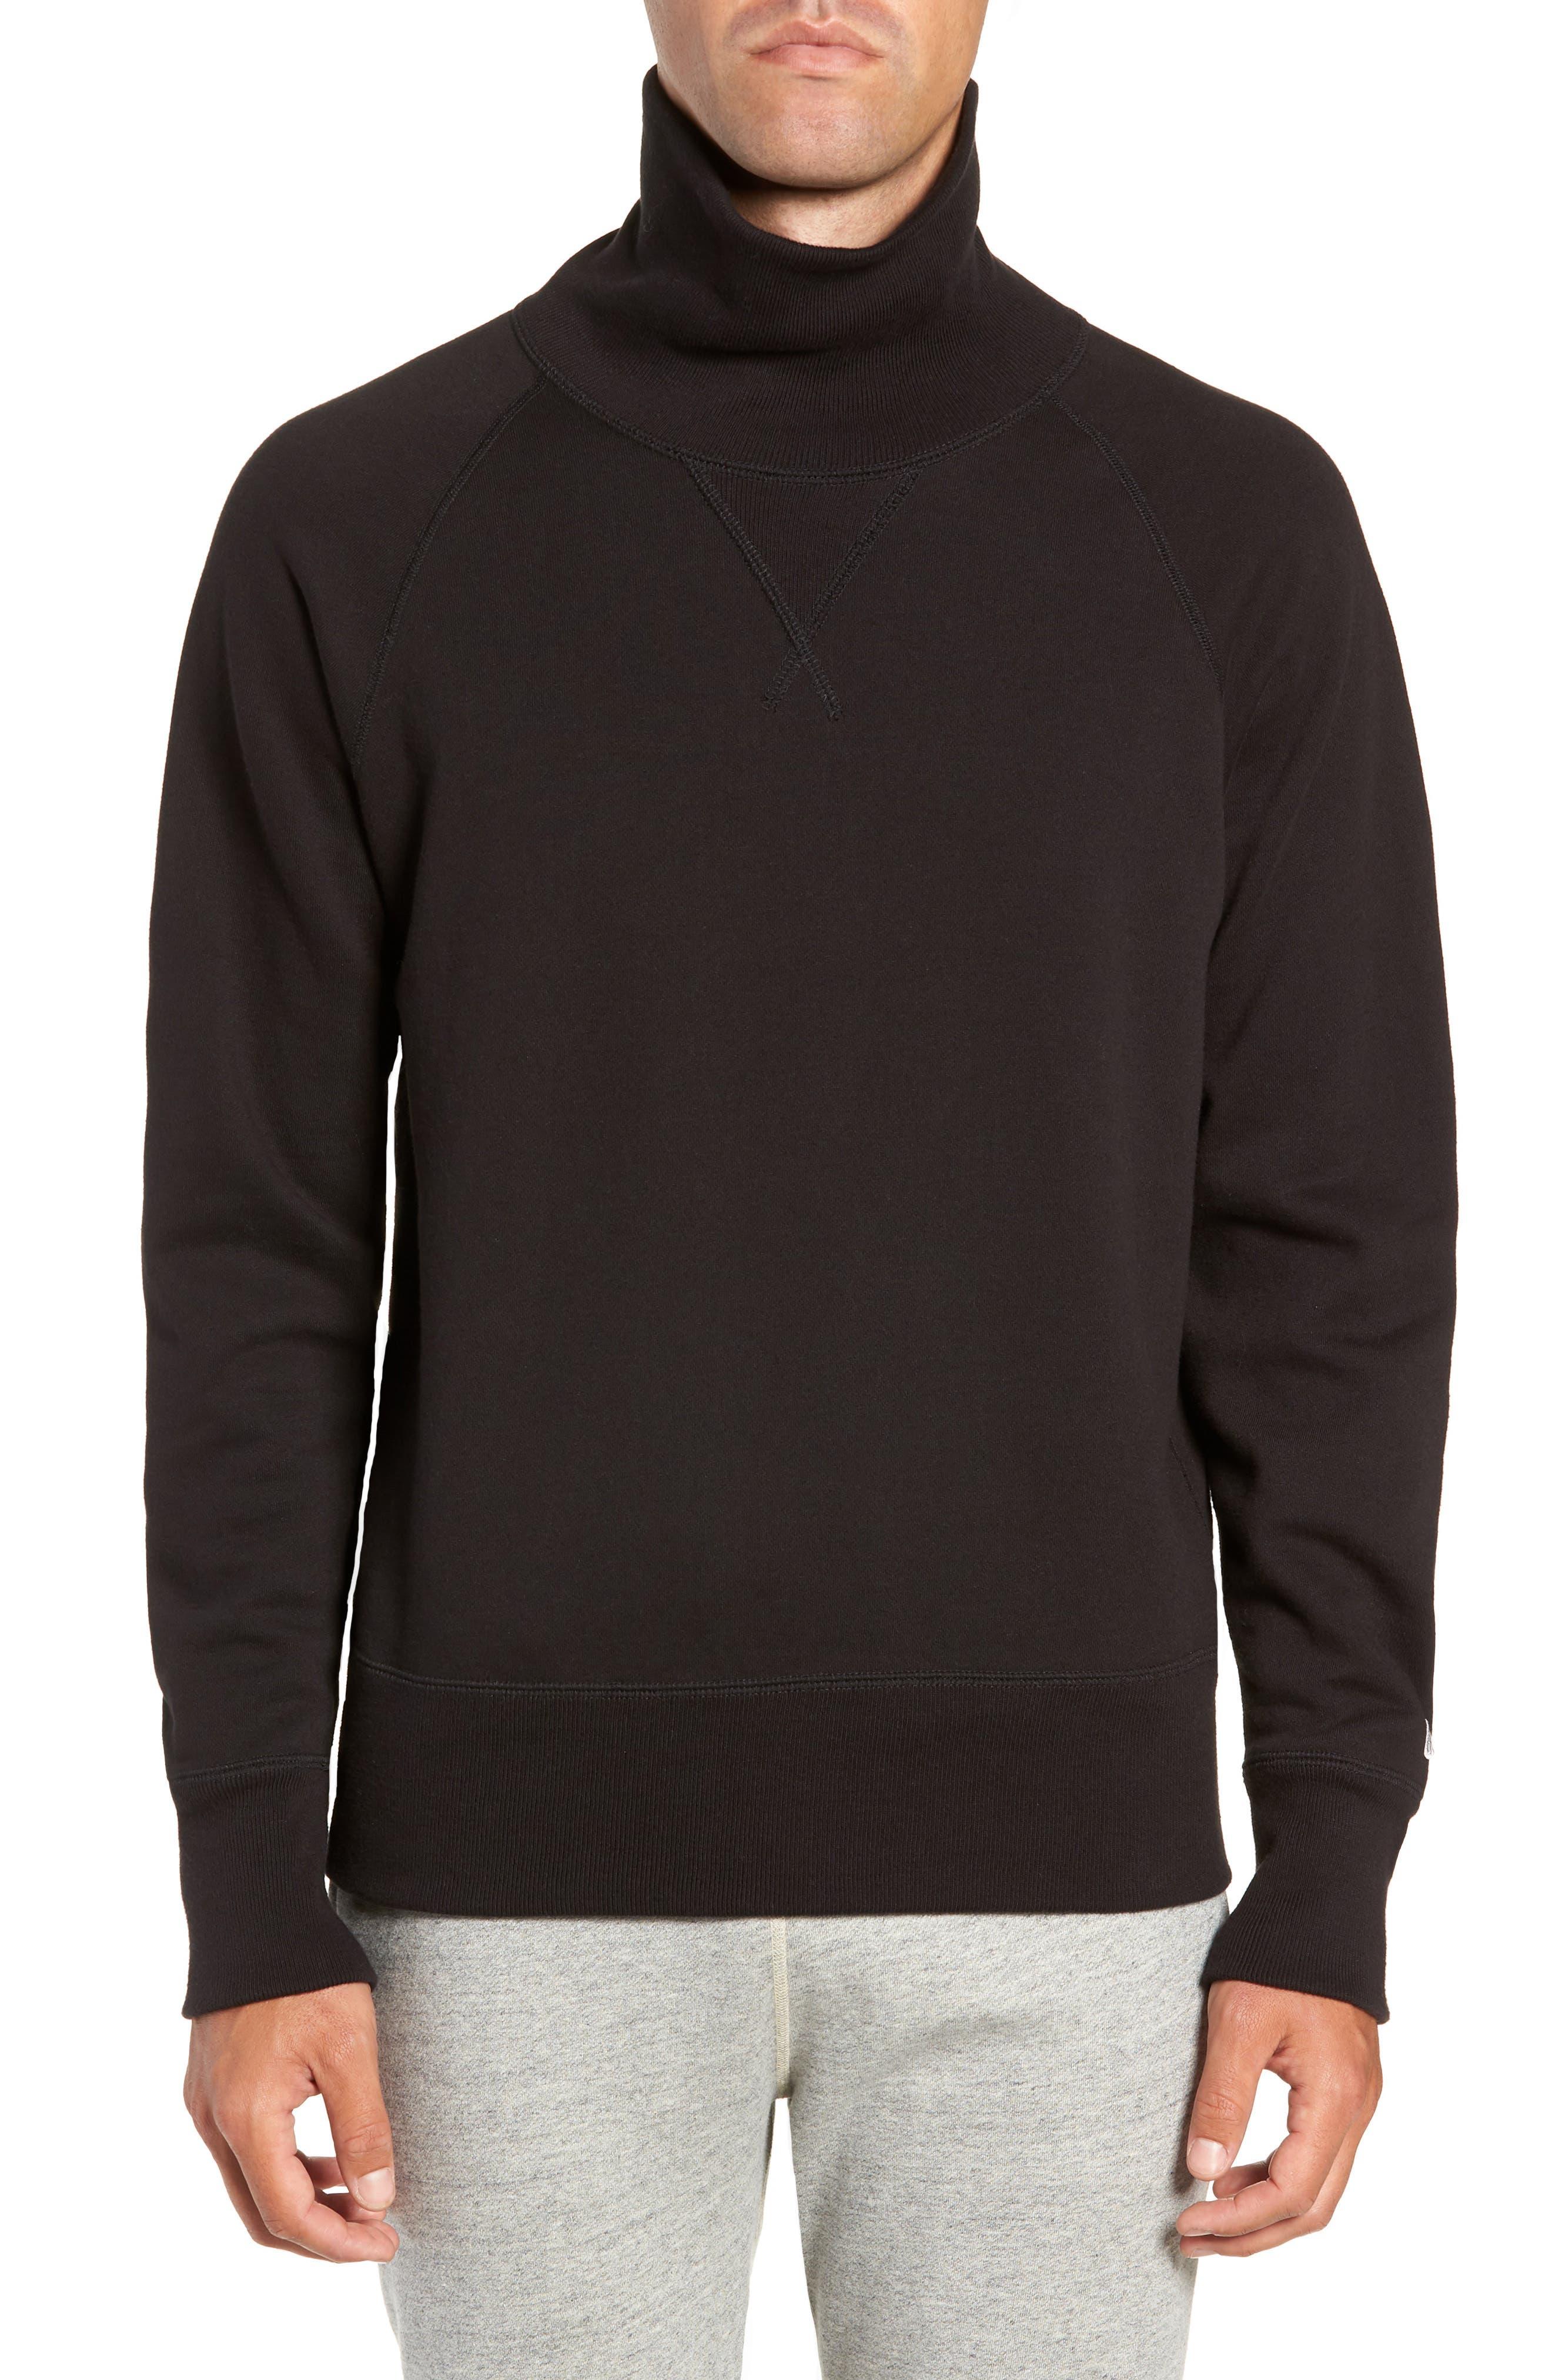 + Champion Turtleneck Sweatshirt,                             Main thumbnail 1, color,                             001